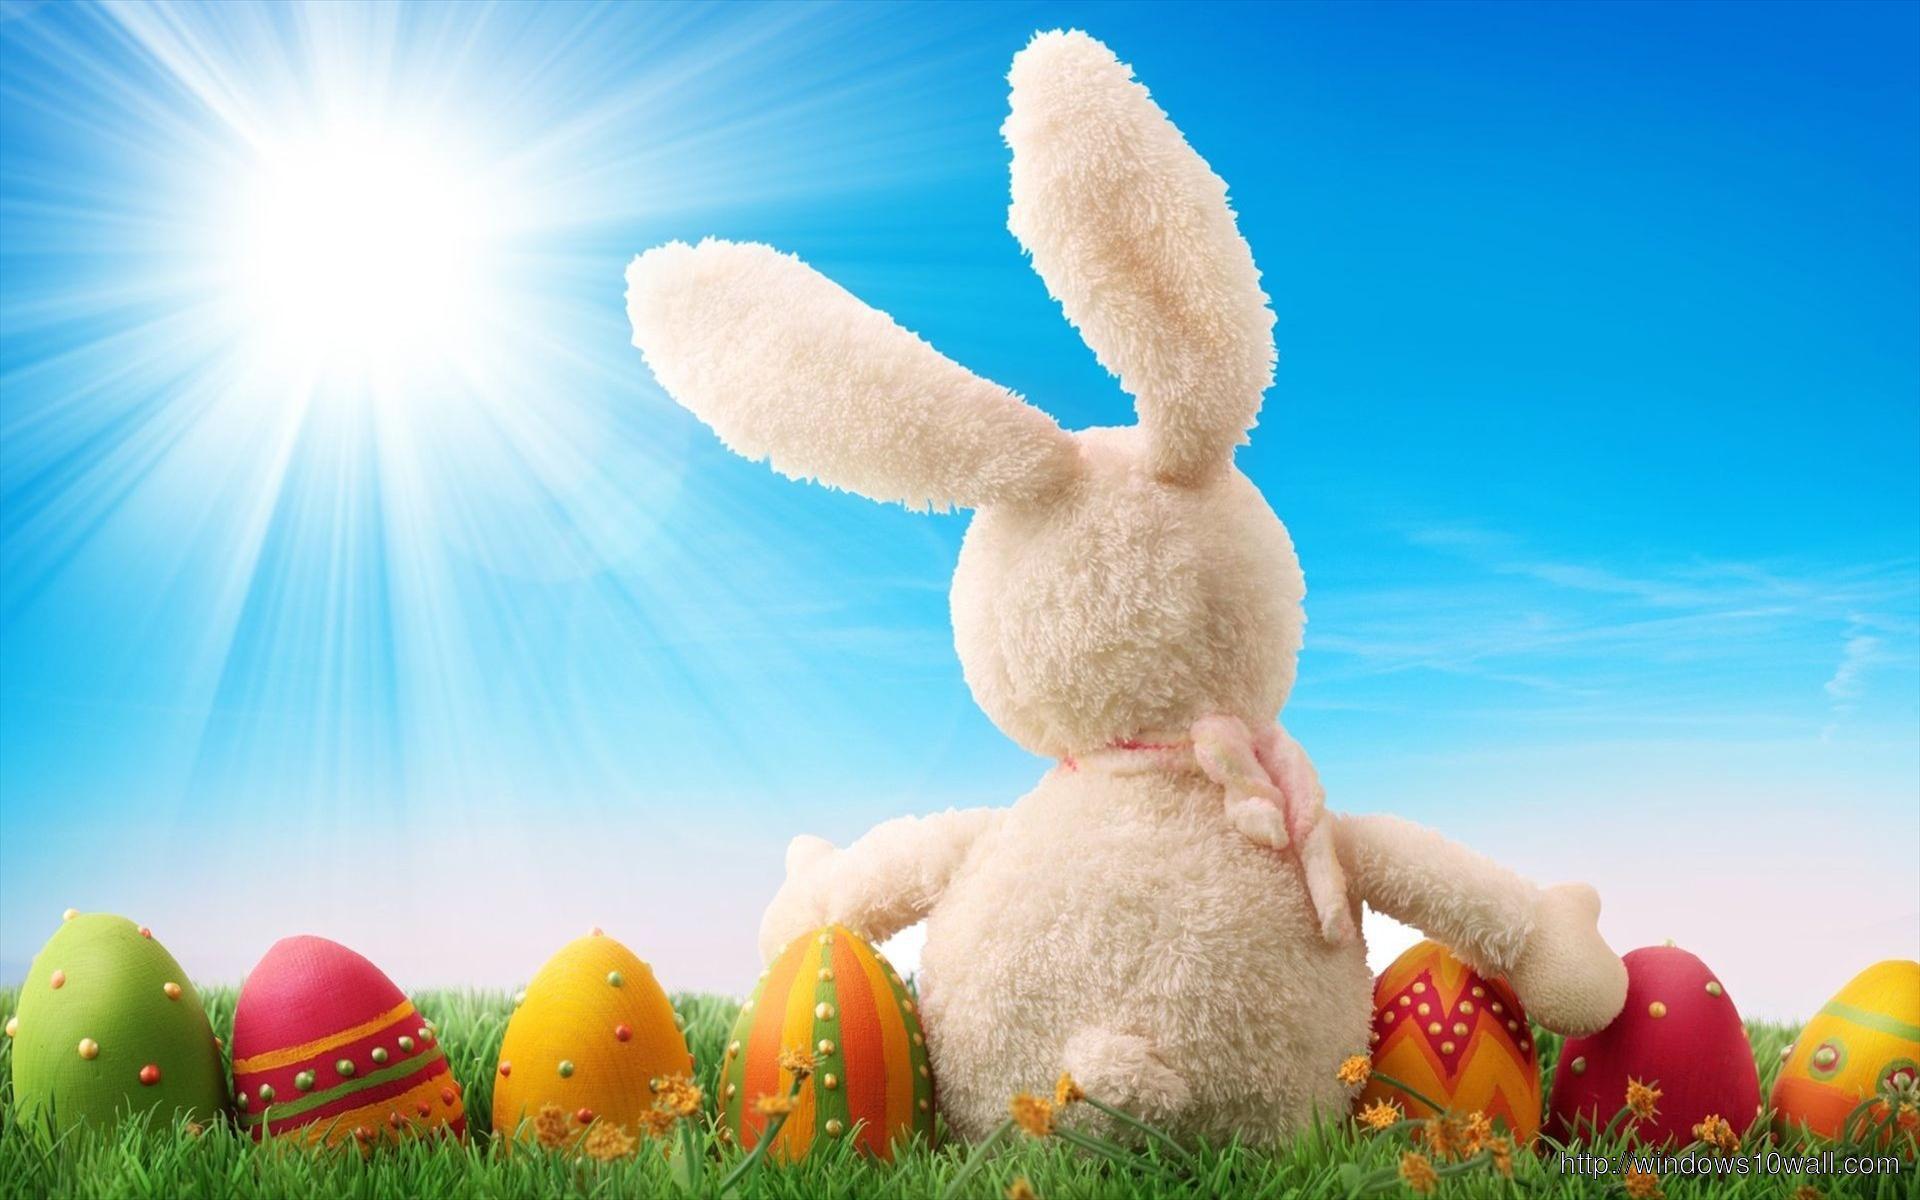 Easter Bunny Widescreen Hd Wallpaper Windows 10 Wallpapers